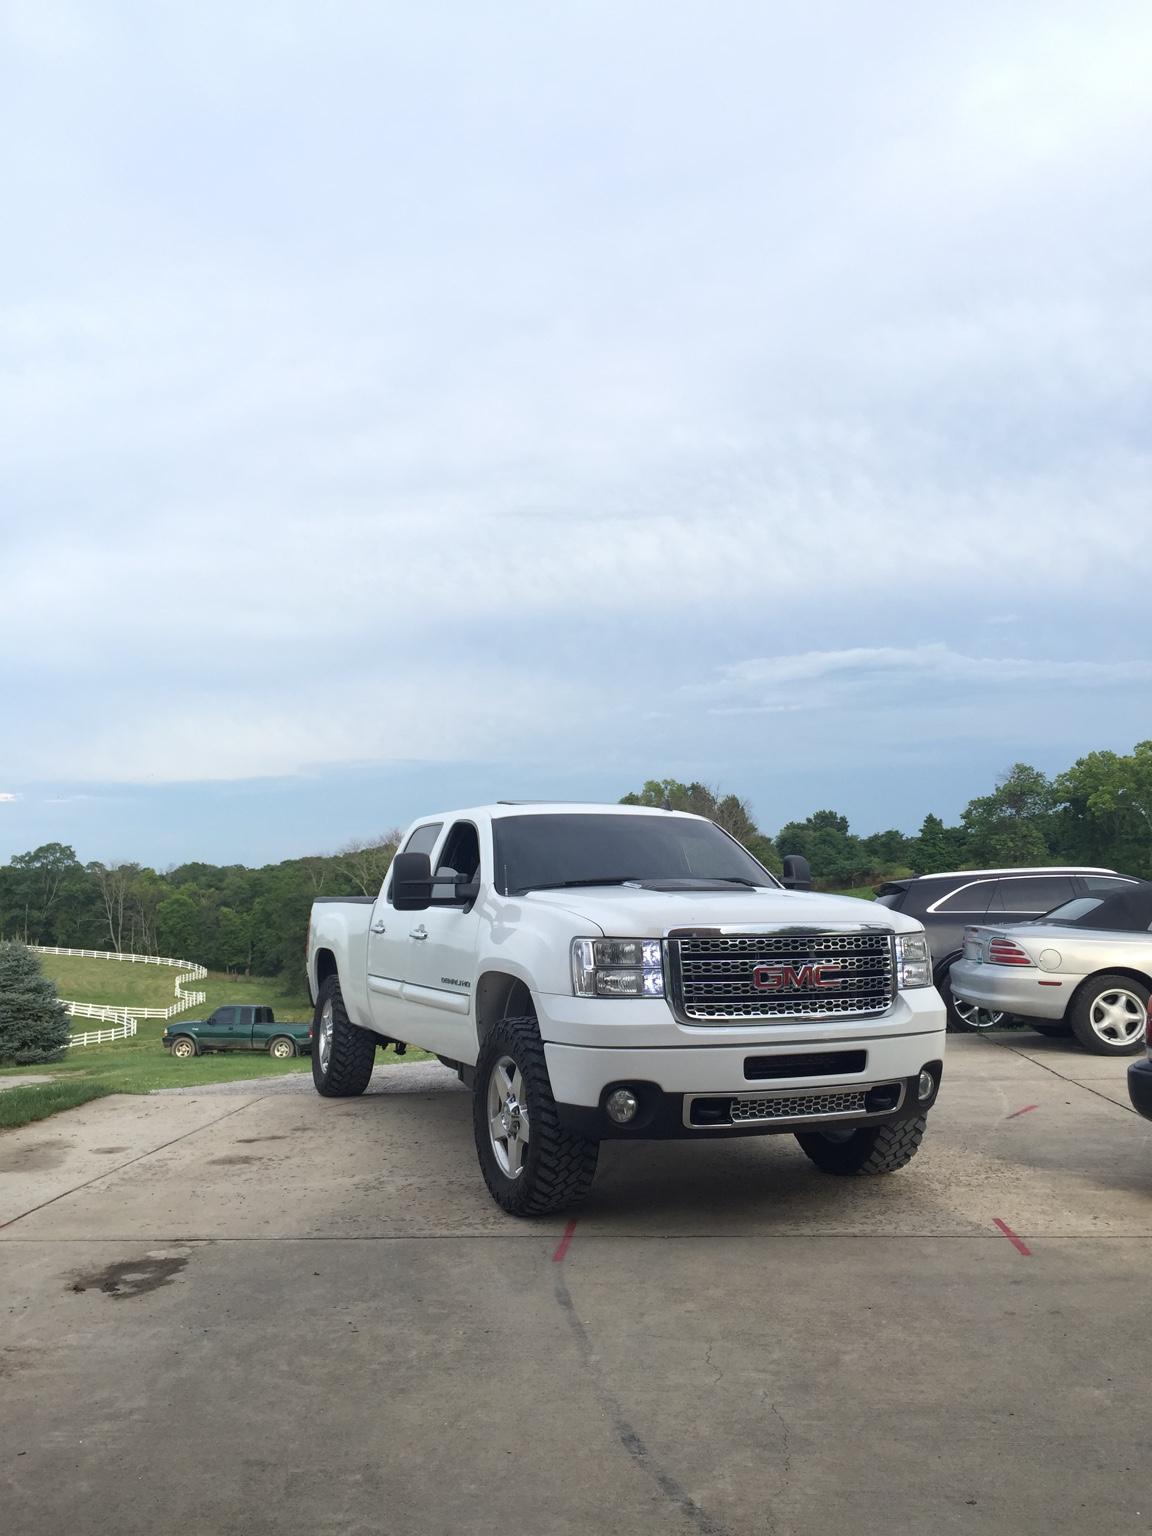 Chevy and GMC Duramax Diesel Forum 33 12 50 20 Stock Wheel